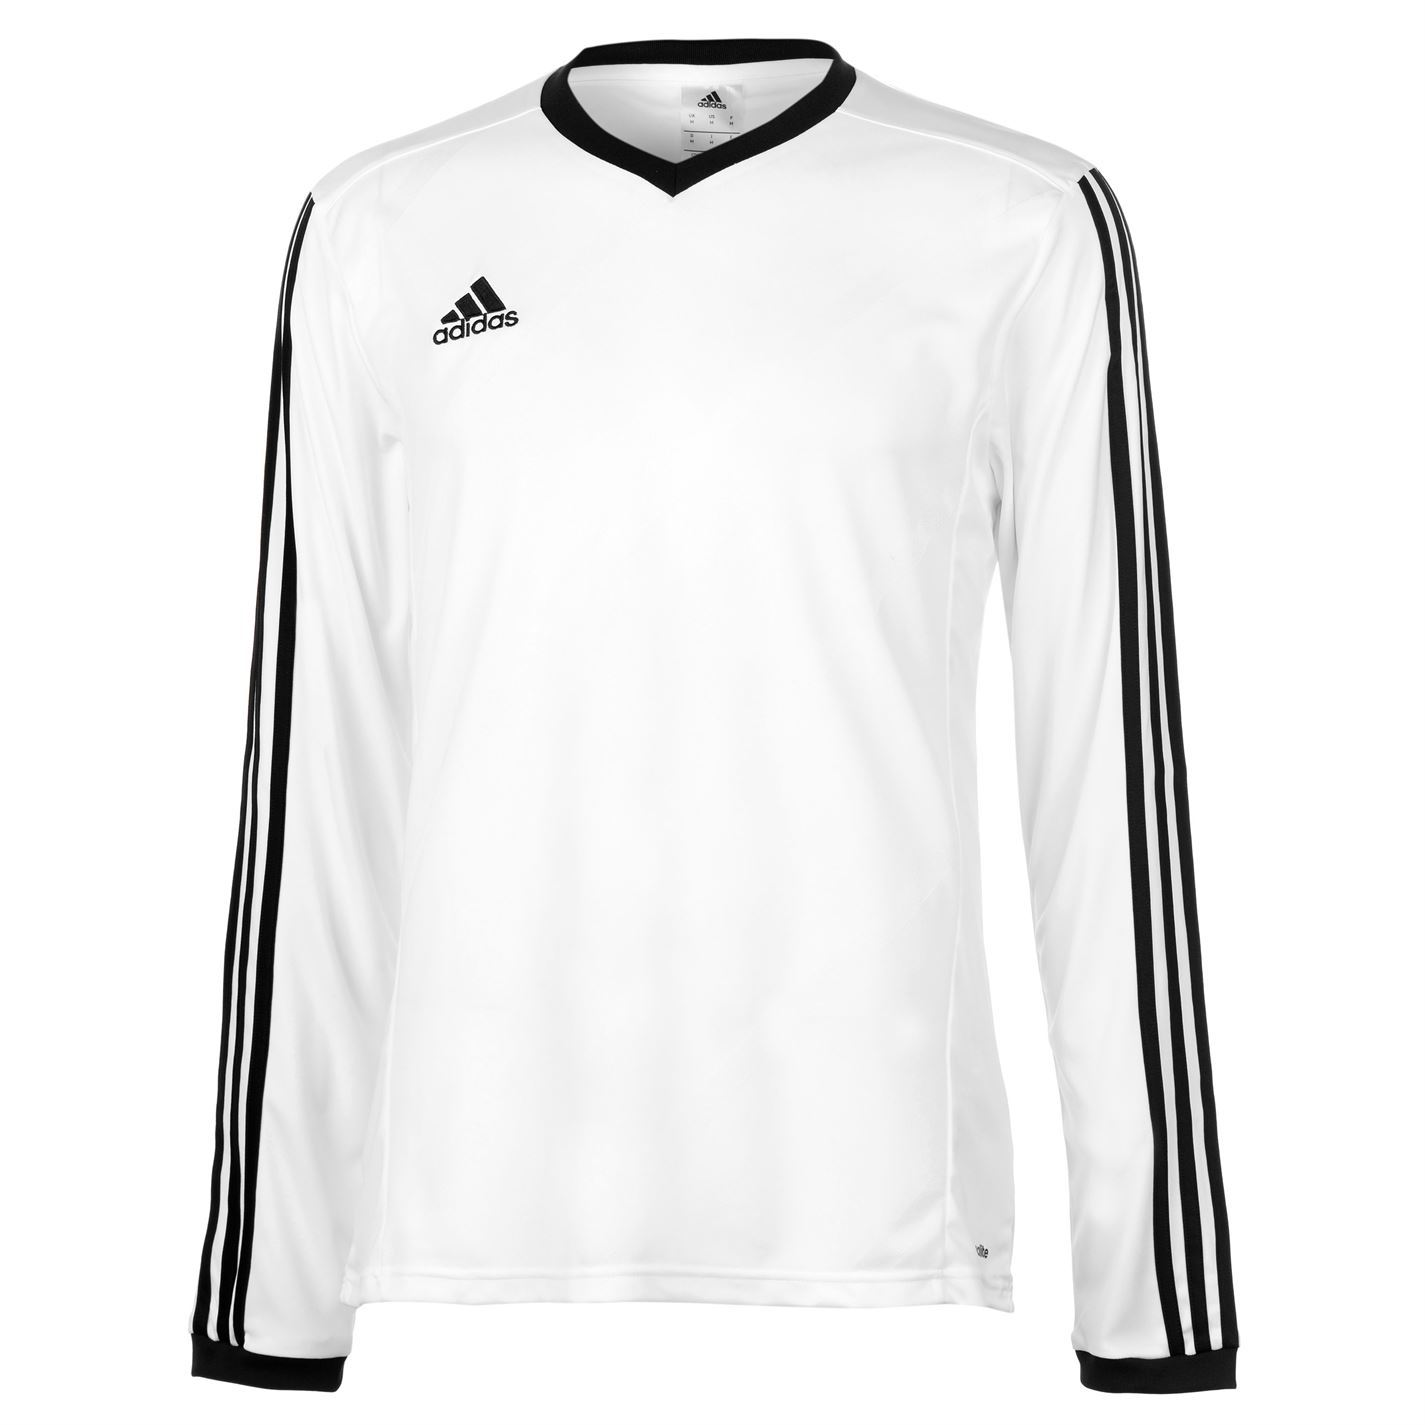 c61a89f3 adidas Football Men Soccer Tabela 14 Long Sleeve Jersey LS Climalite ...